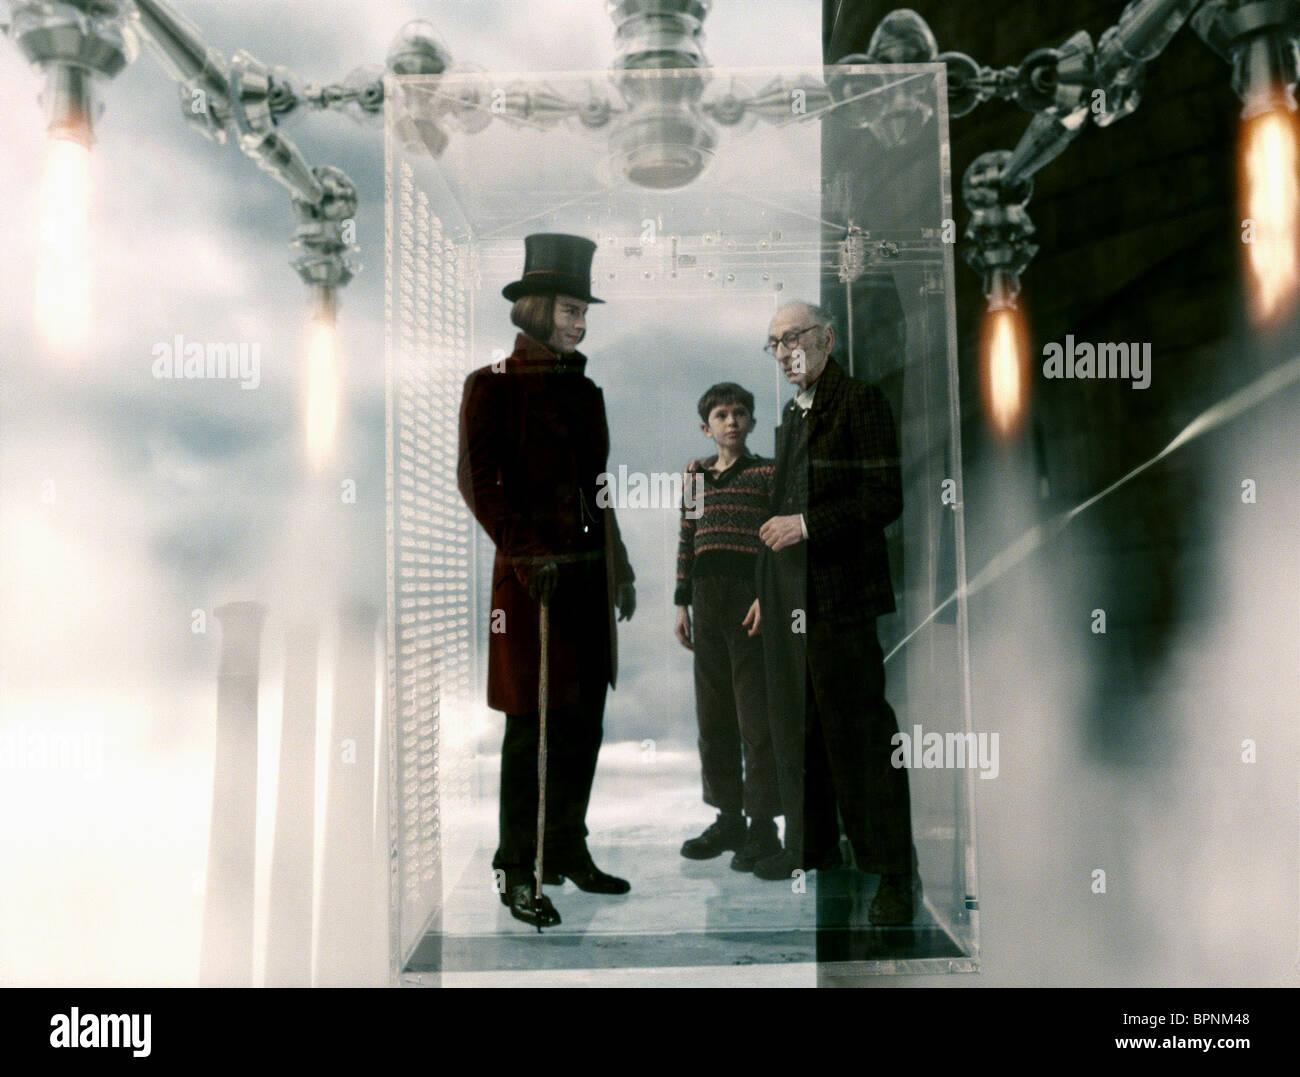 JOHNNY DEPP FREDDIE HIGHMORE & DAVID KELLY IN THE GLASS ELEVATOR ...